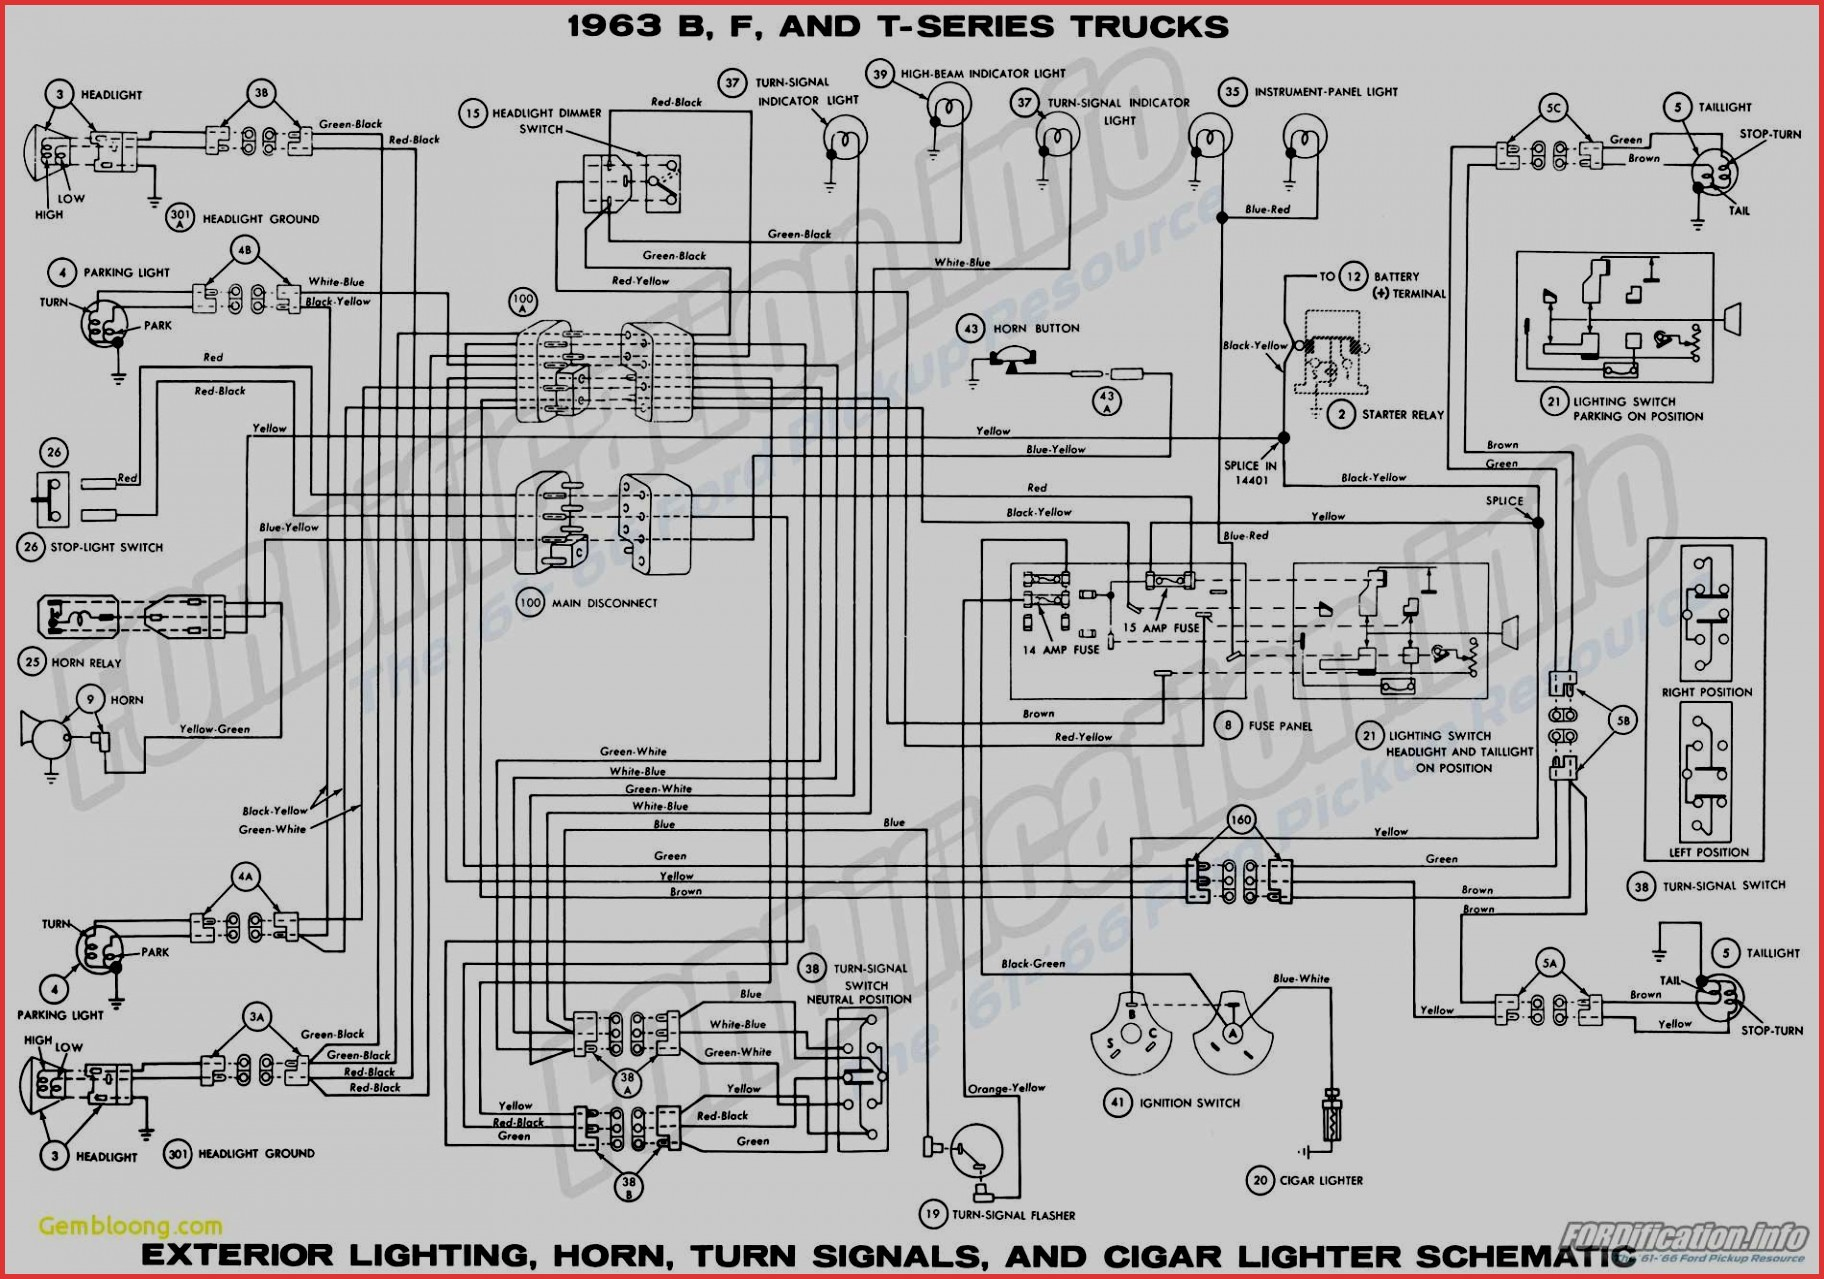 4 Way Dimmer Switch Wiring Diagram Headlight Dimmer Switch Wiring Diagram Ecourbano Serverfo Of 4 Way Dimmer Switch Wiring Diagram